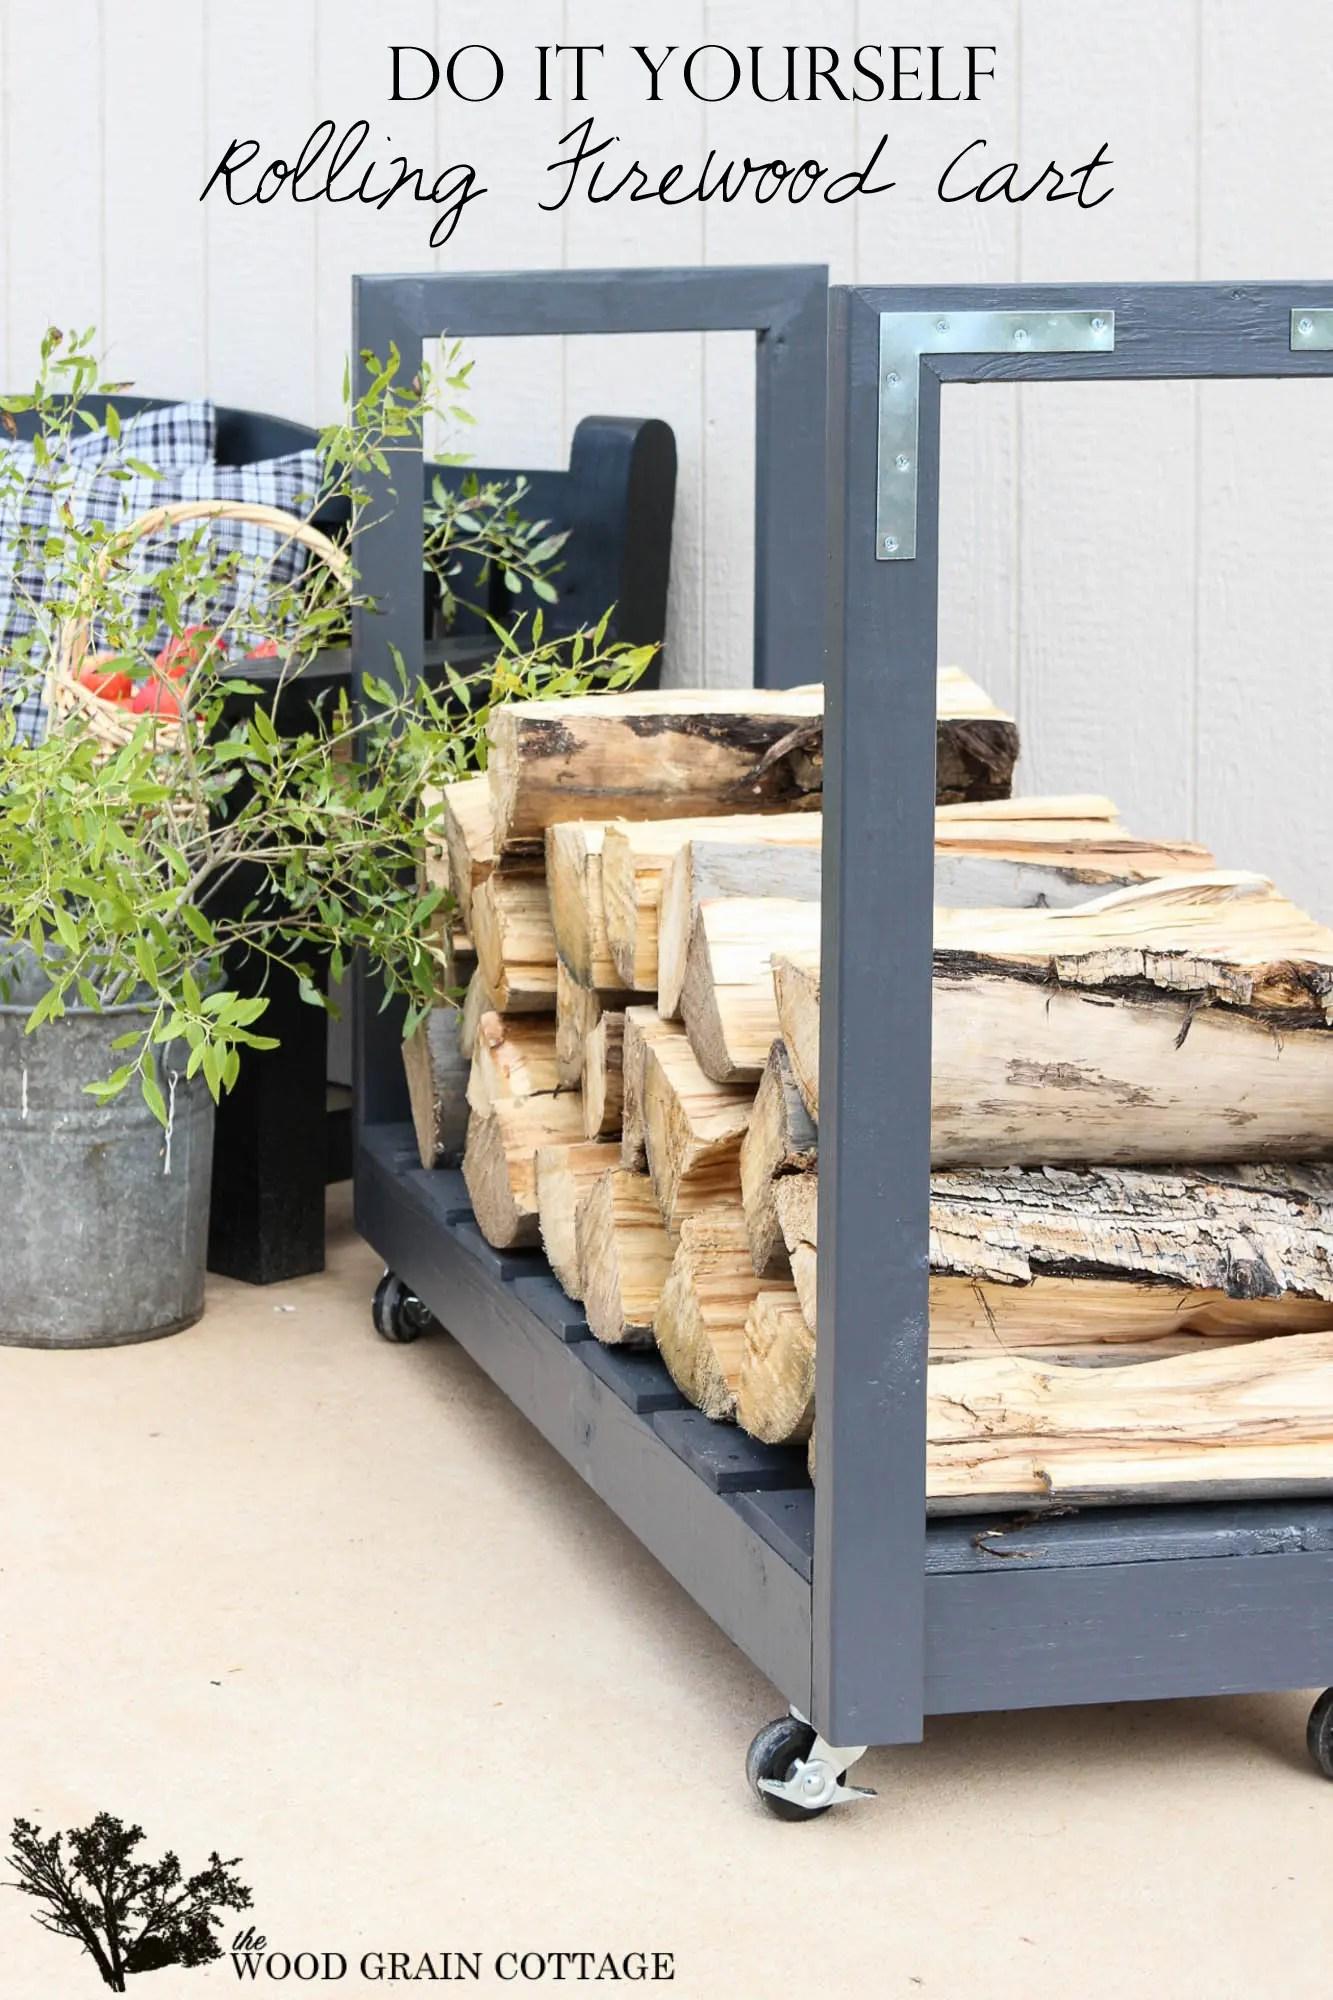 diy rolling firewood cart the wood